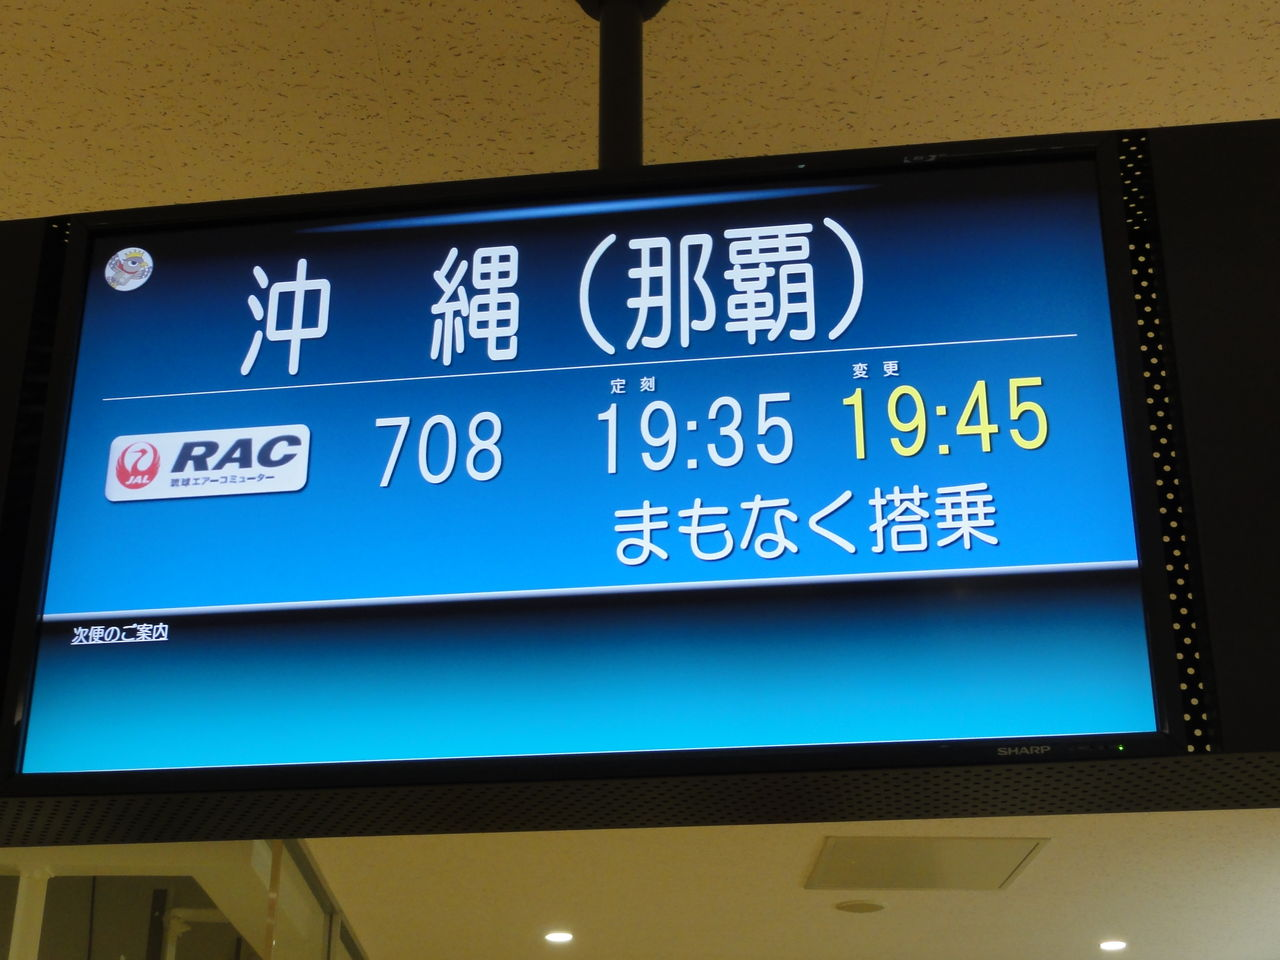 FLY! FLY HIGH!!タグ:RAC708[2014-09-06]140510 RAC708 ISG-OKA Y